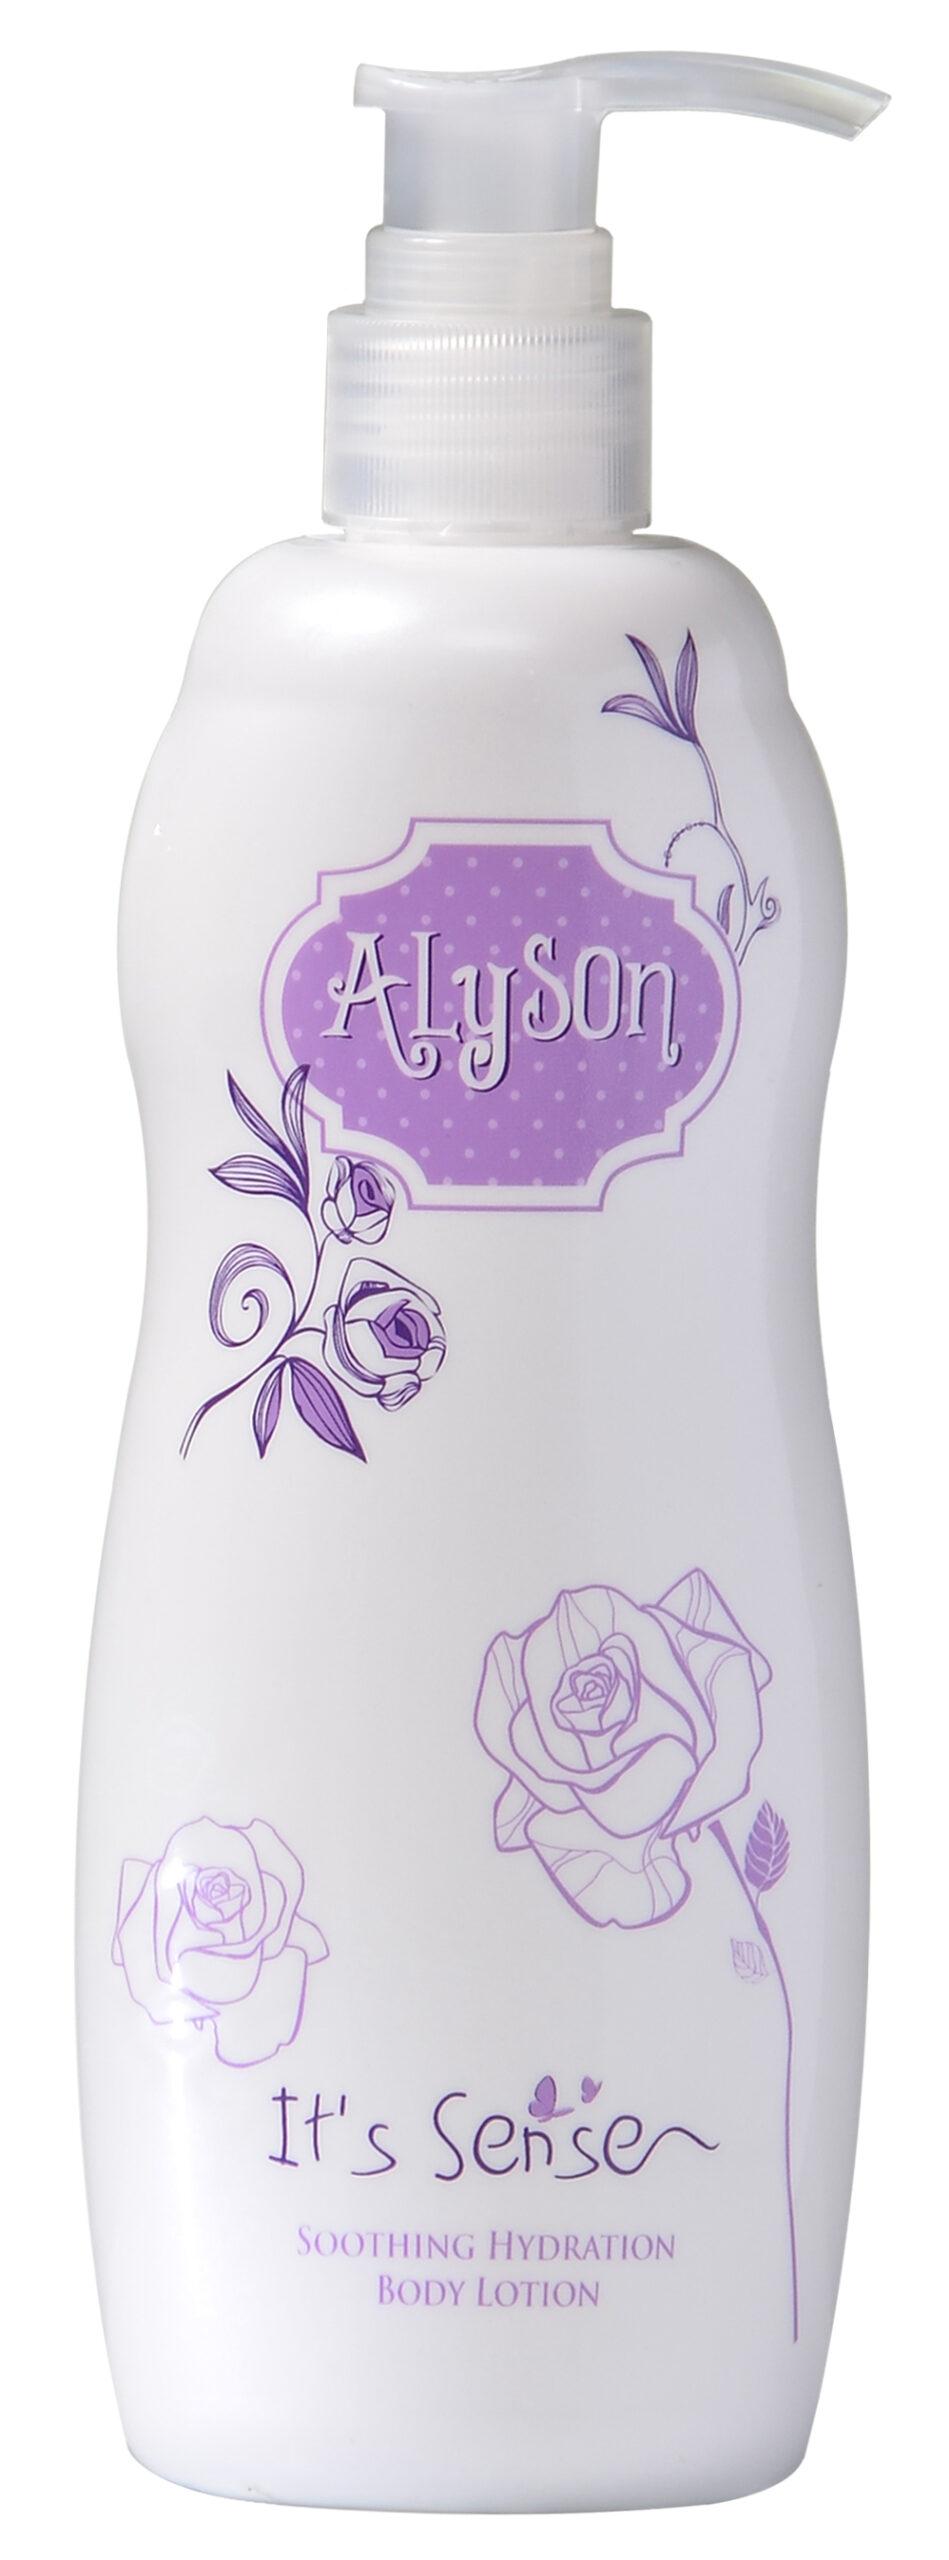 Alyson It's Sense Perfumed Lotion 300gm